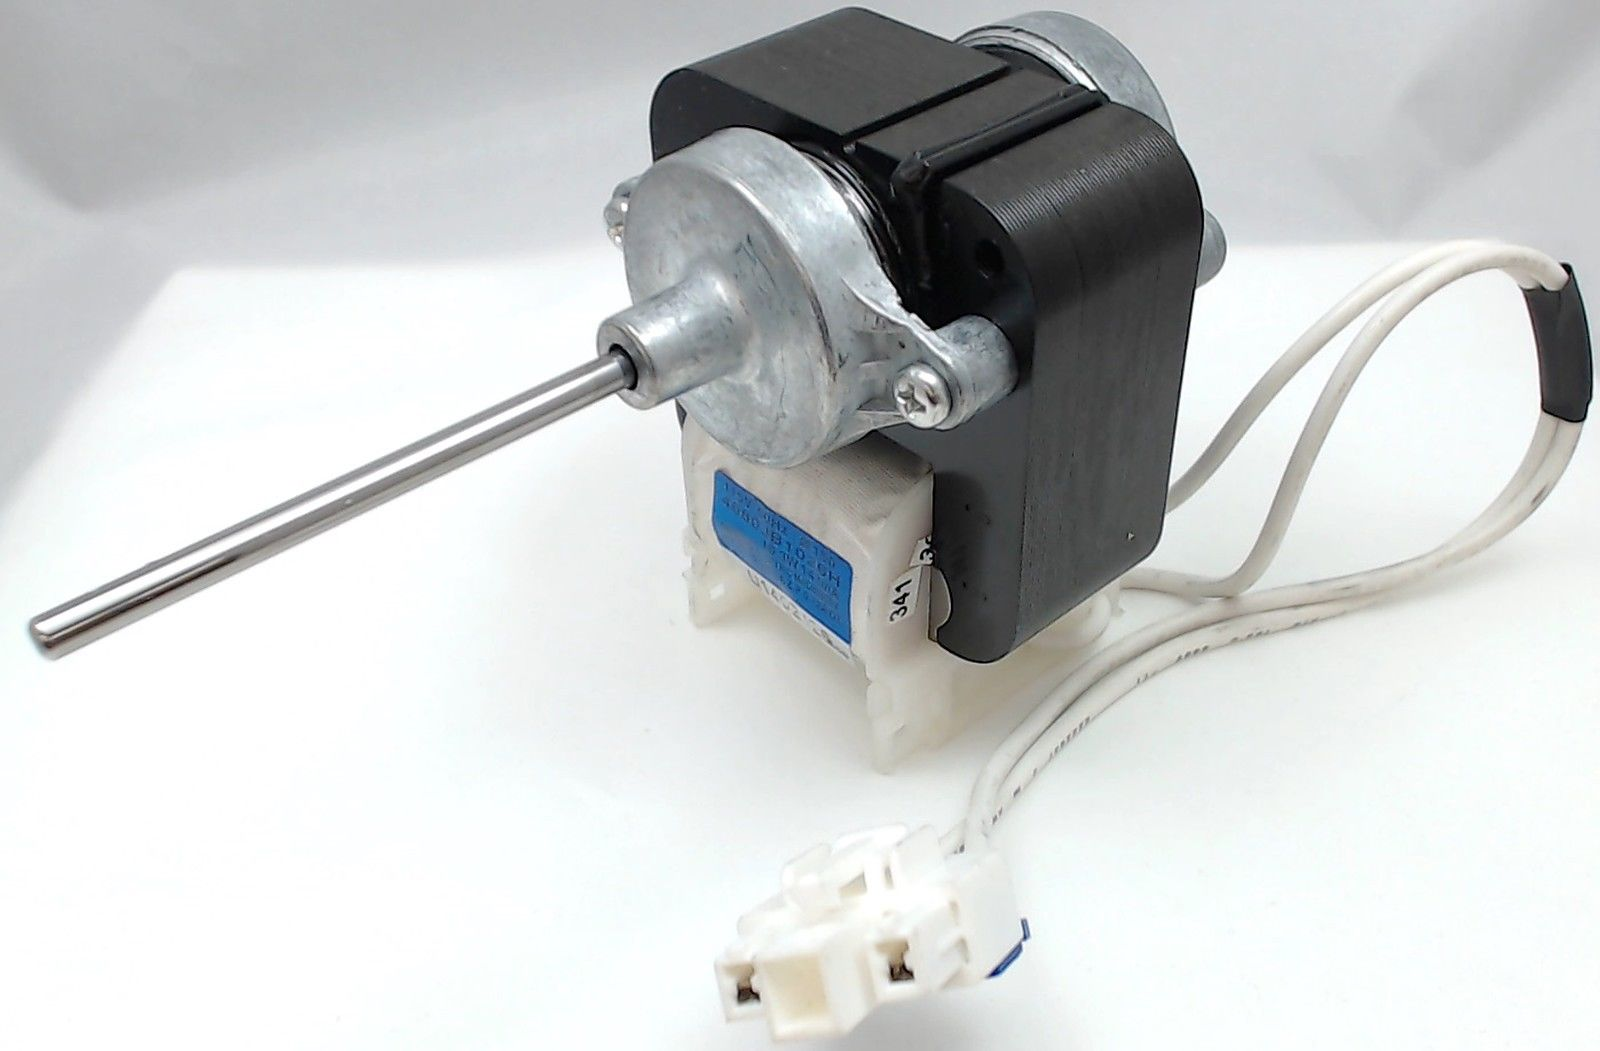 Refrigerator condenser fan motor for lg ap4440743 for Refrigerator condenser fan motor